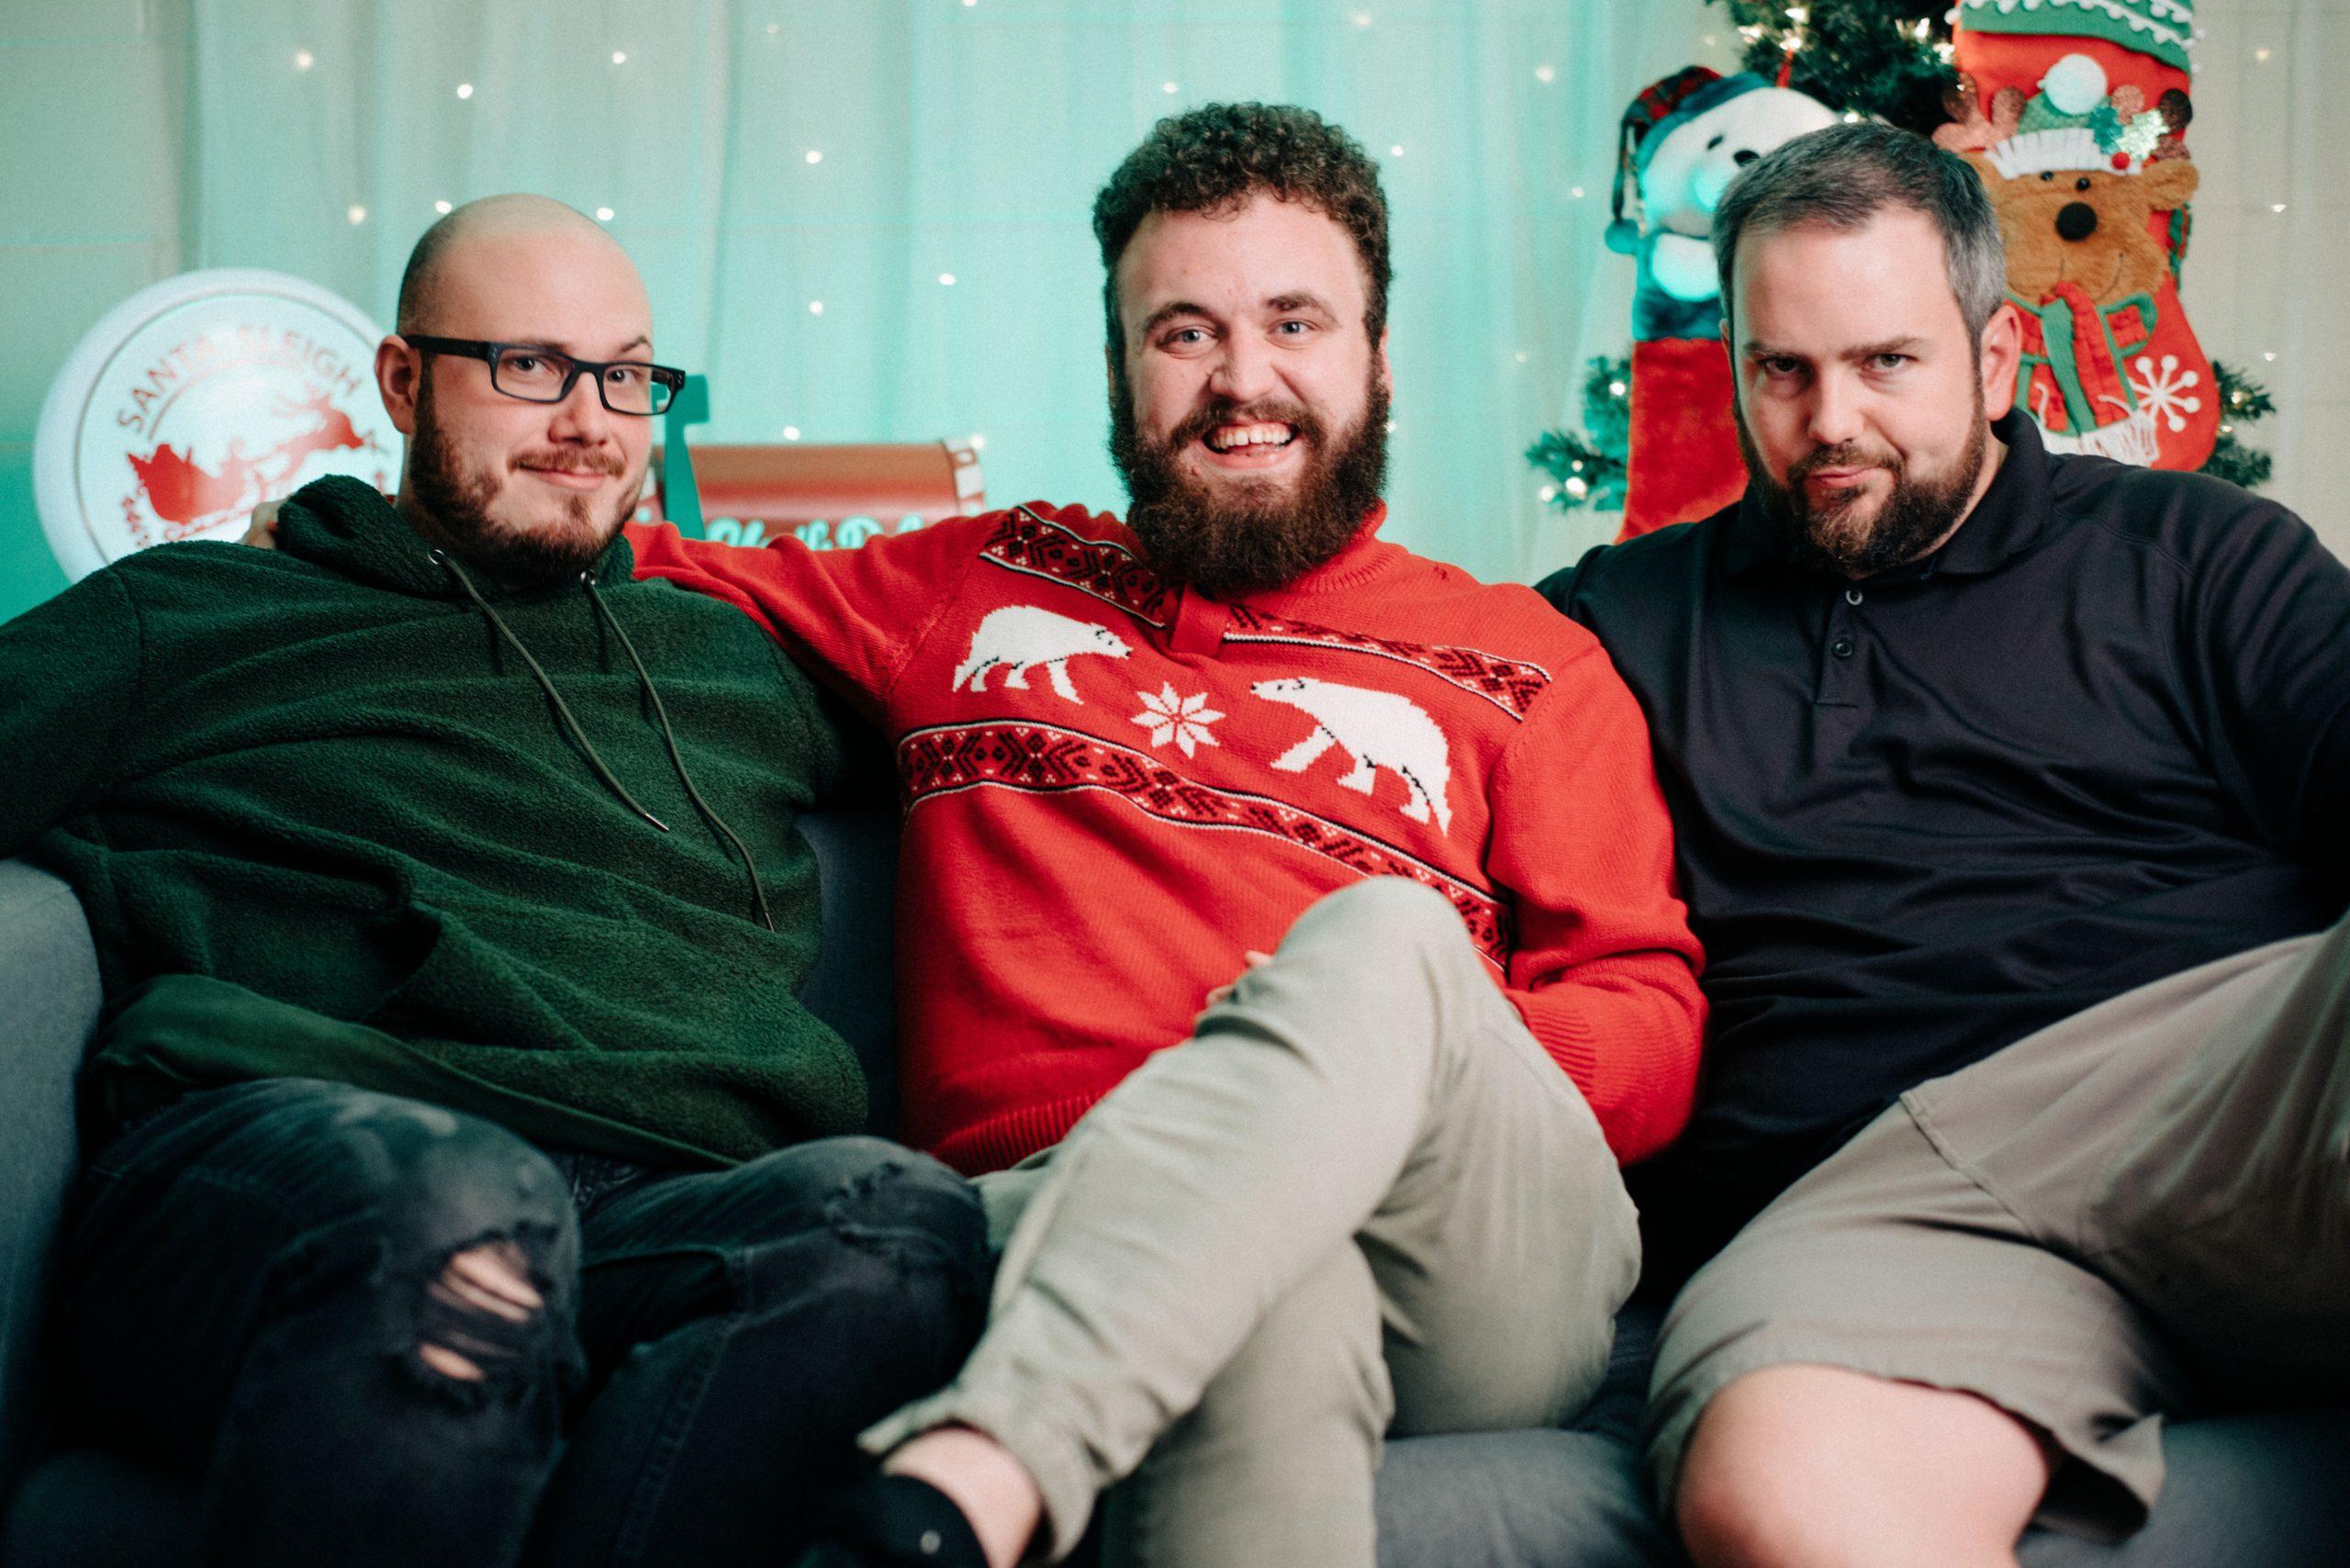 DECK THE HALLMARK--Panda, Brandon, and Dan